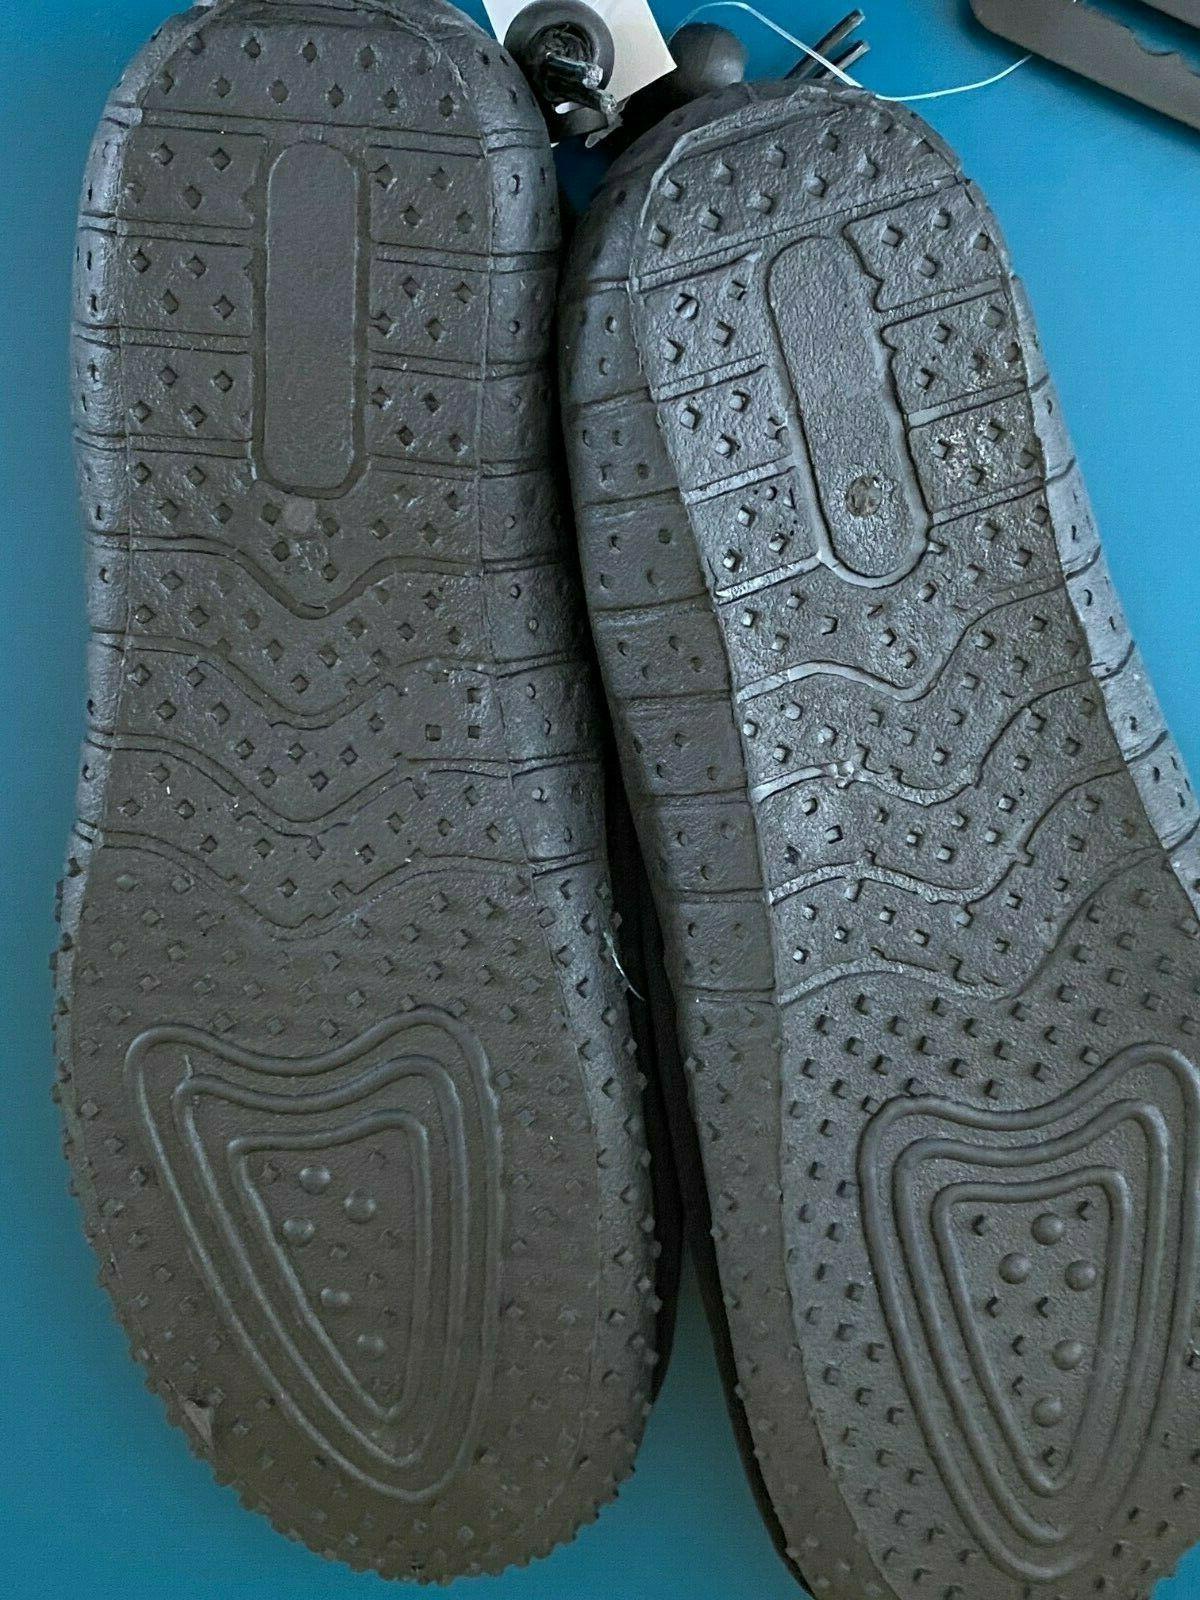 Shoes Sz Socks Slip Beach Swim